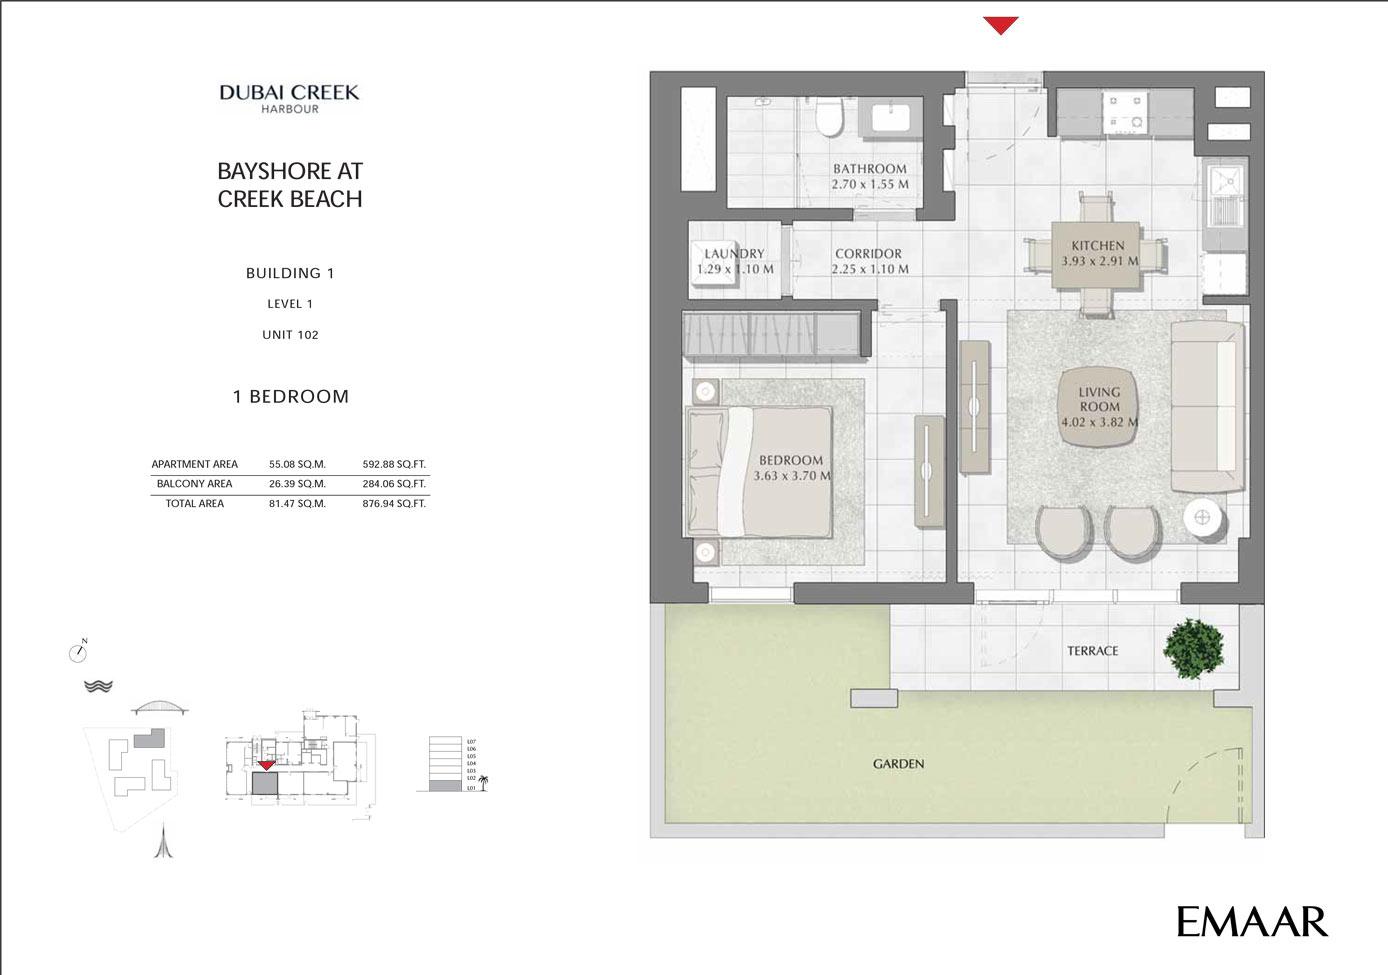 Building 1 - 1 Bedroom Level 1 Unit 102, Size 876 sq ft